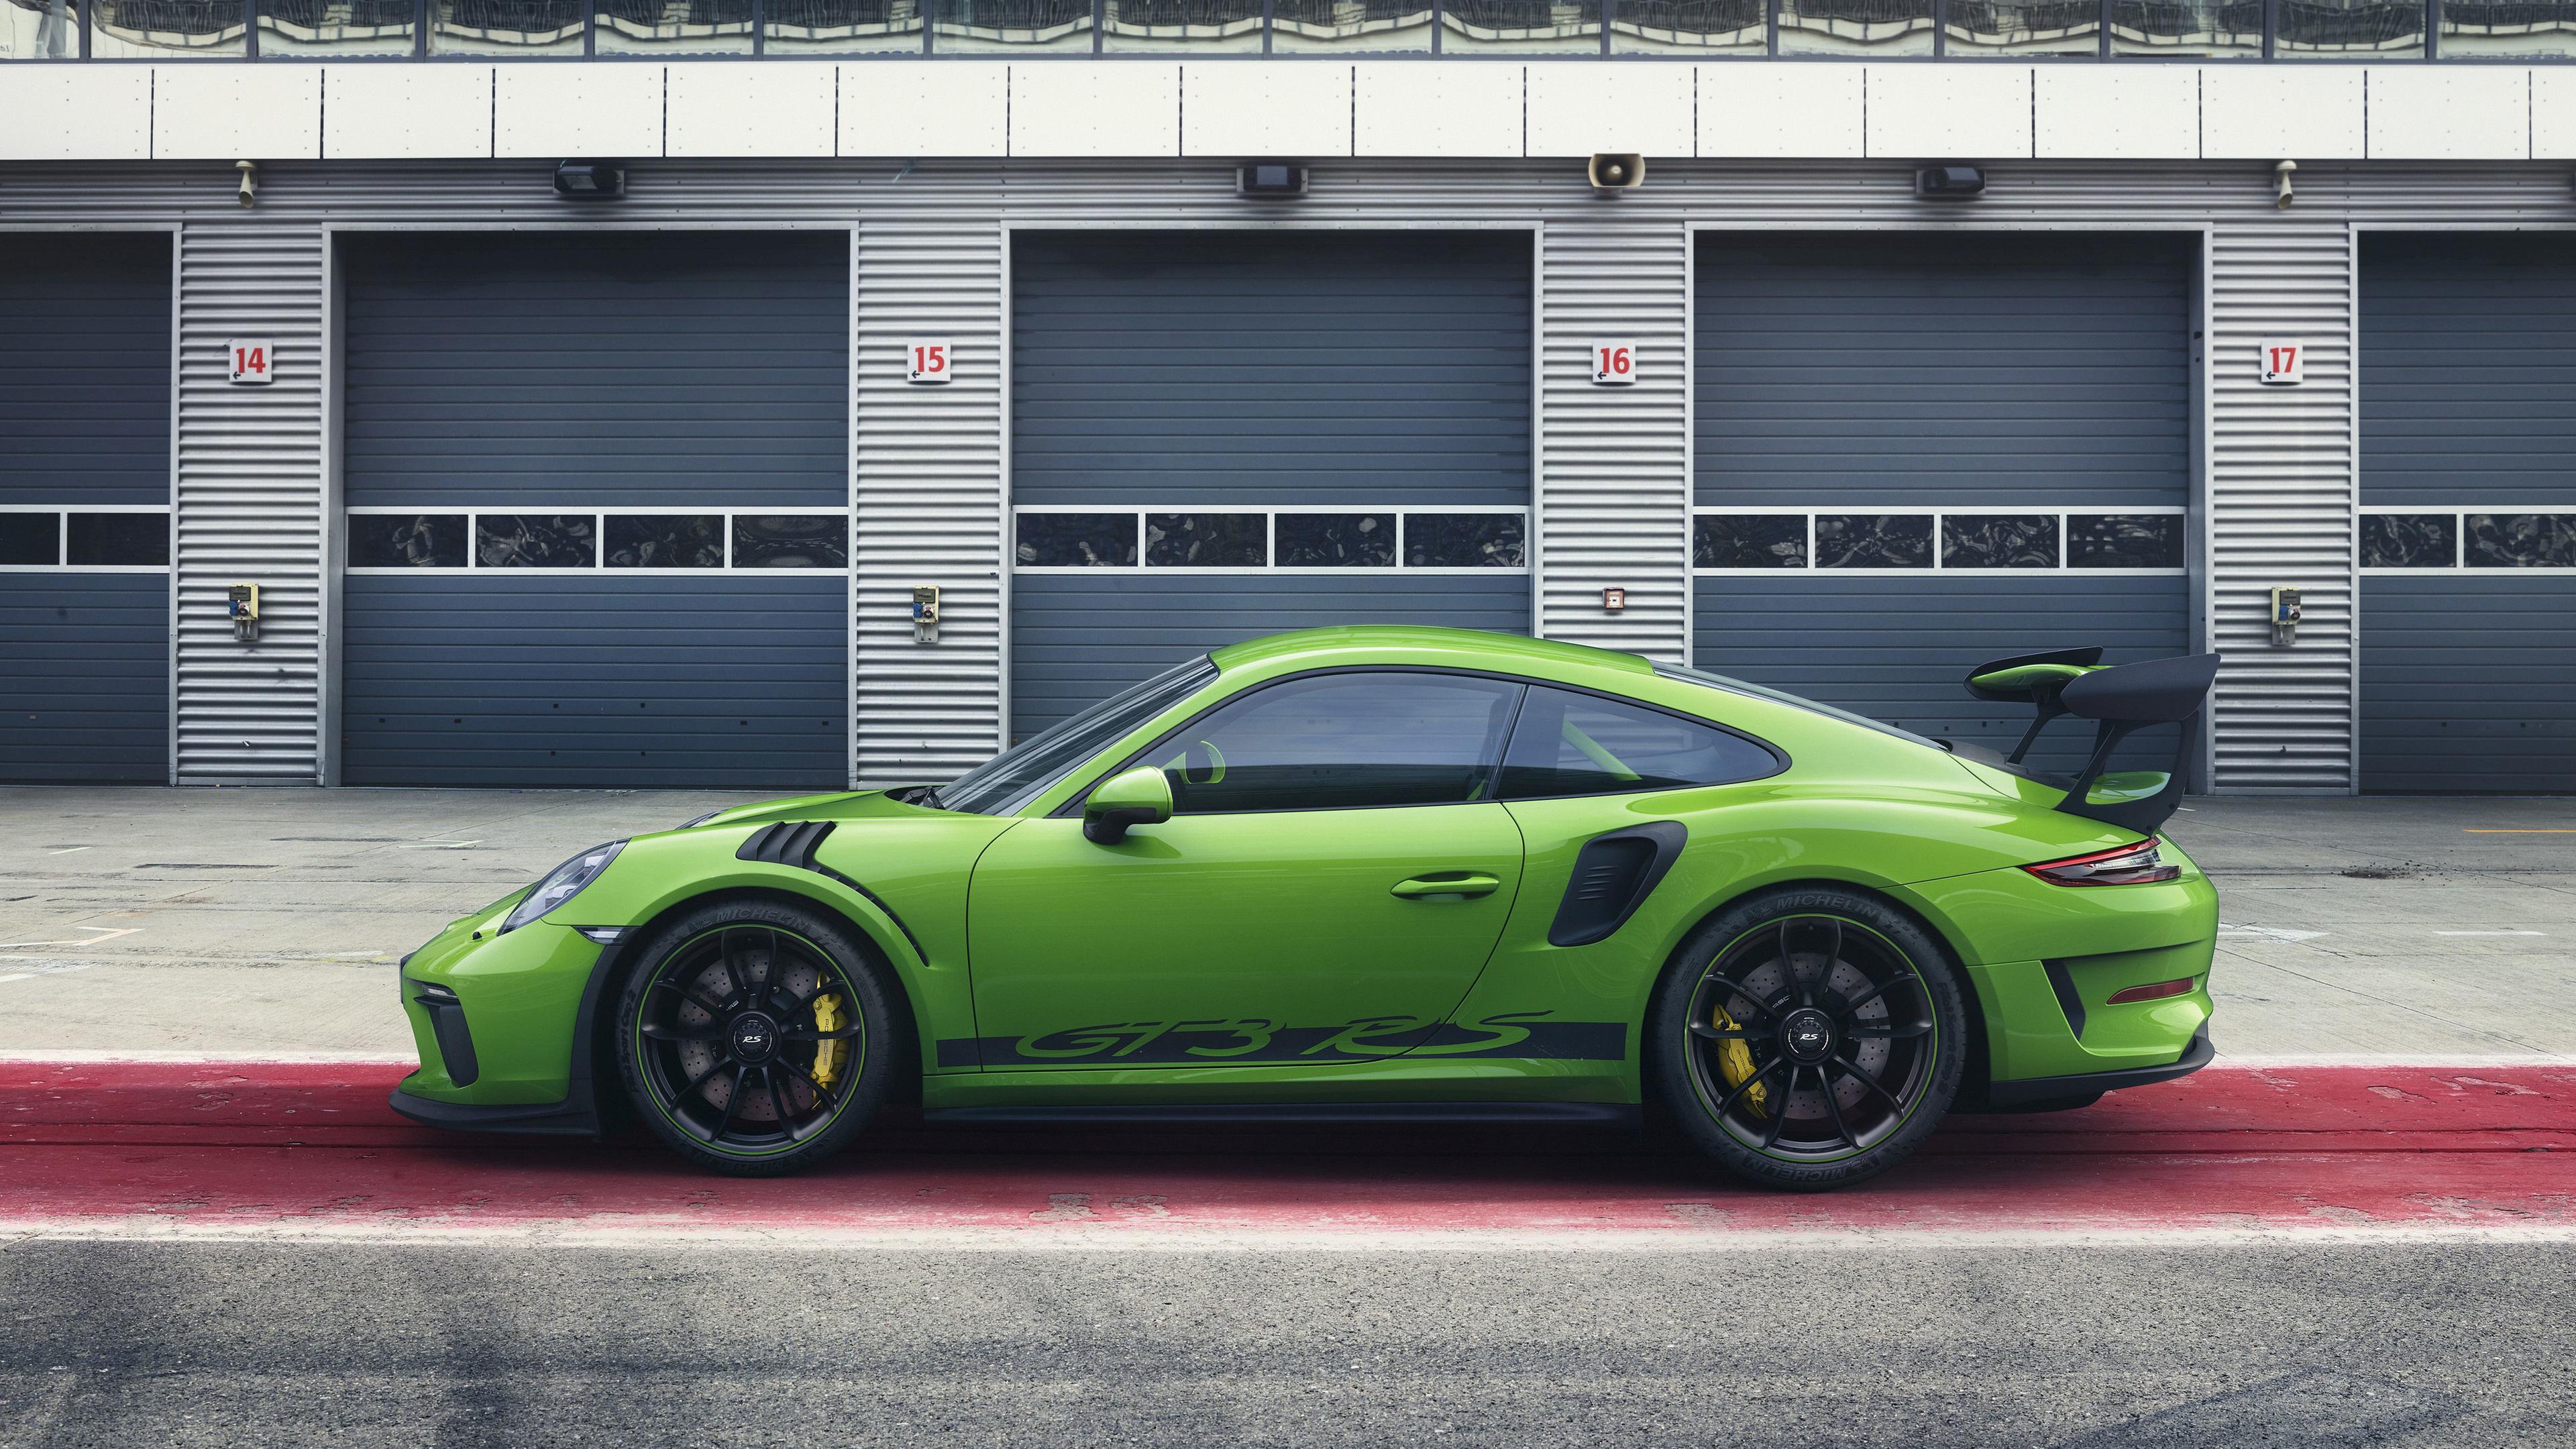 porsche 911 gt3 rs 2018 side view 1539109943 - Porsche 911 GT3 RS 2018 Side View - porsche wallpapers, porsche 911 wallpapers, hd-wallpapers, cars wallpapers, 4k-wallpapers, 2018 cars wallpapers